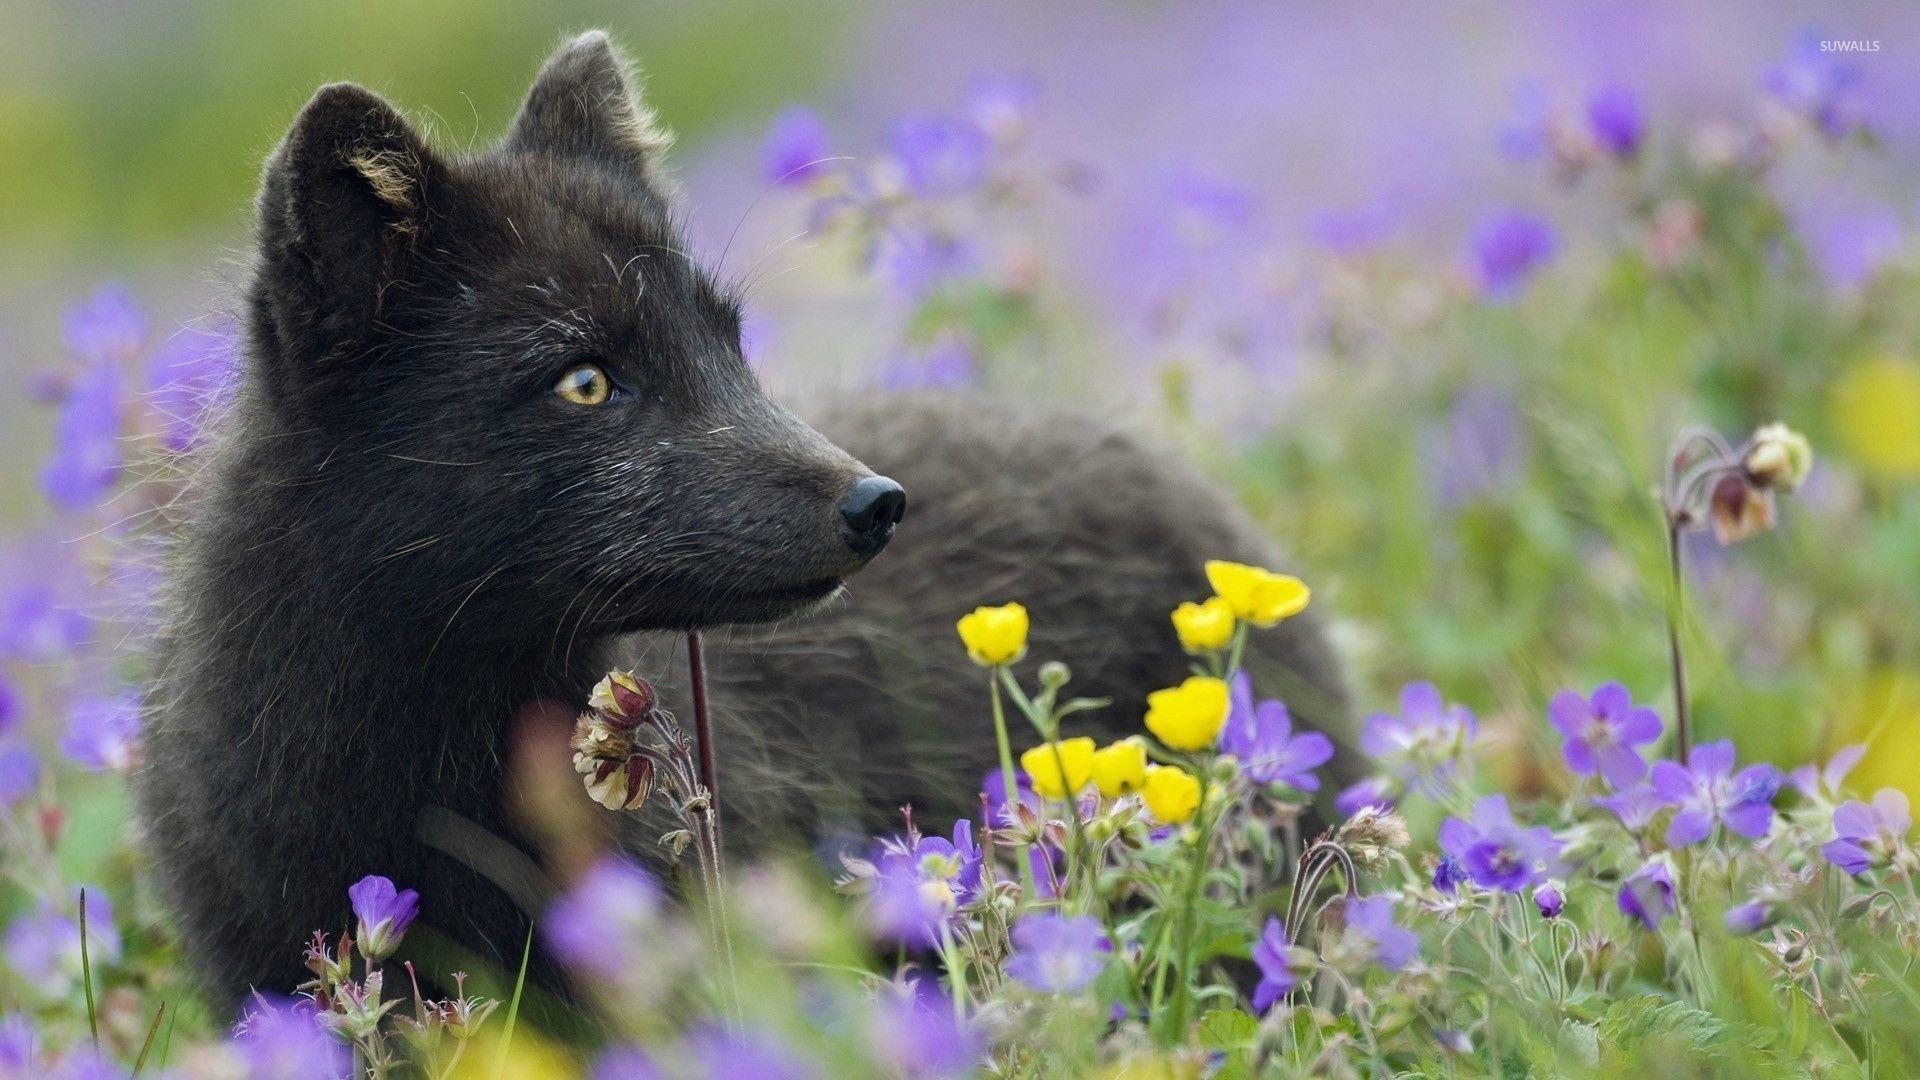 Black Fox 2 Wallpaper Animal Wallpapers 32750